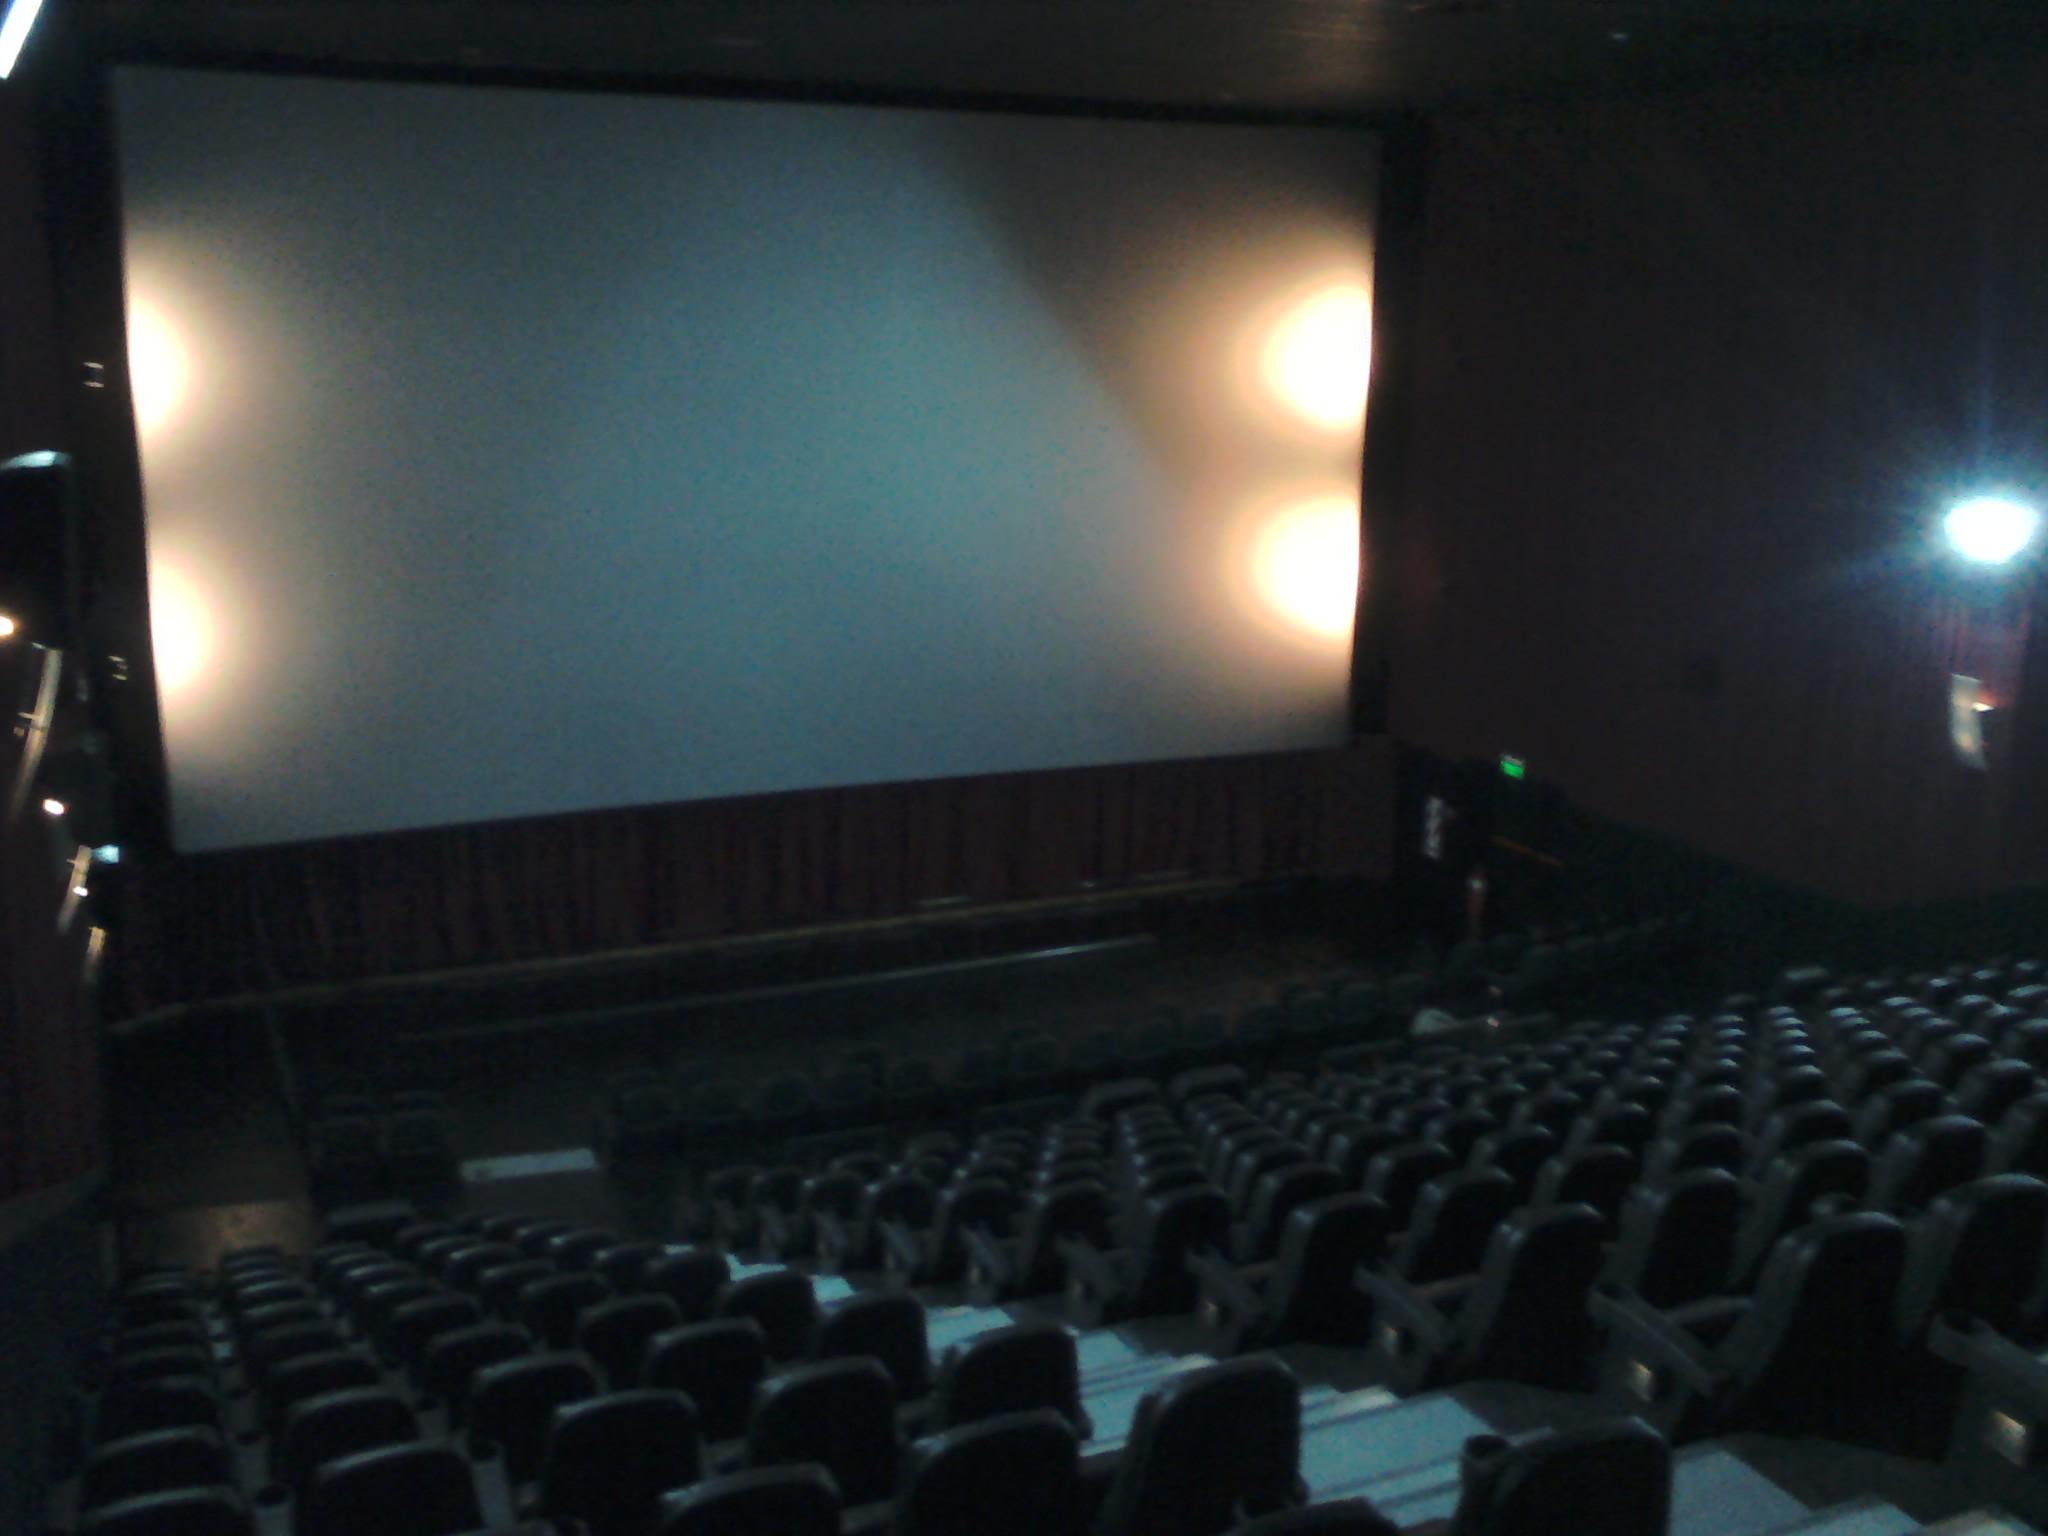 DOBILIA SA Construcciones - Cinemark Santa Fe - Sala 7 3D - 2